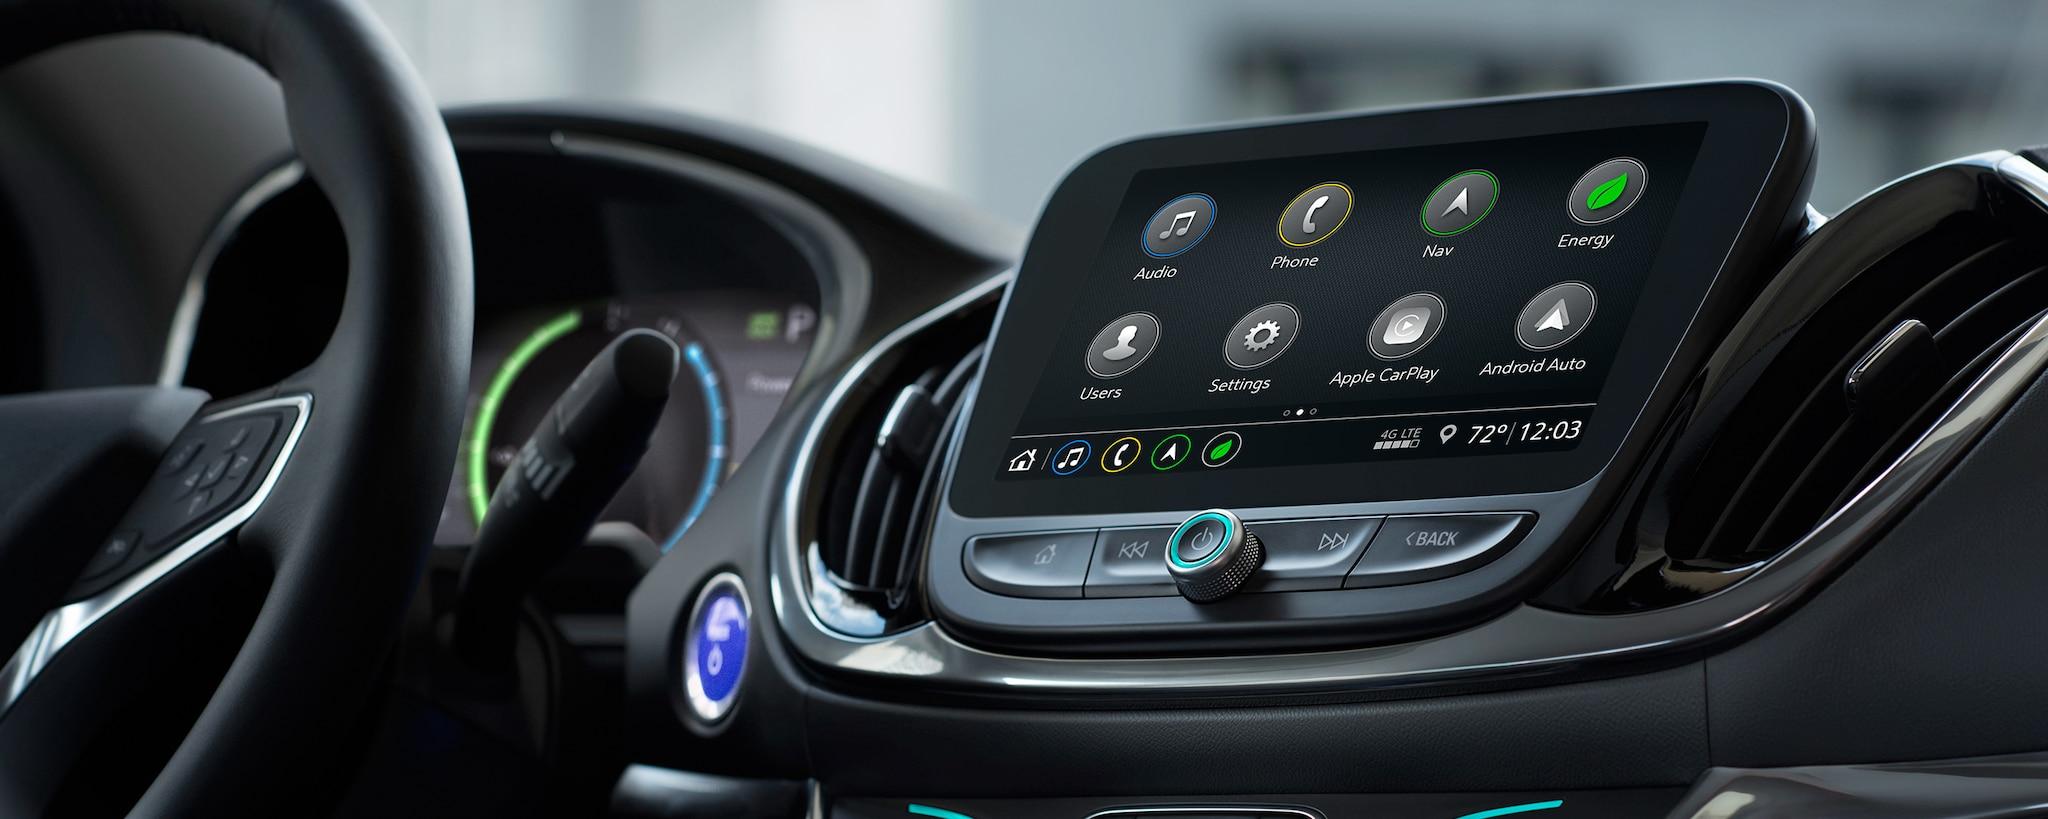 Tecnología del híbrido para enchufar Volt 2019: Radio con pantalla táctil a colores